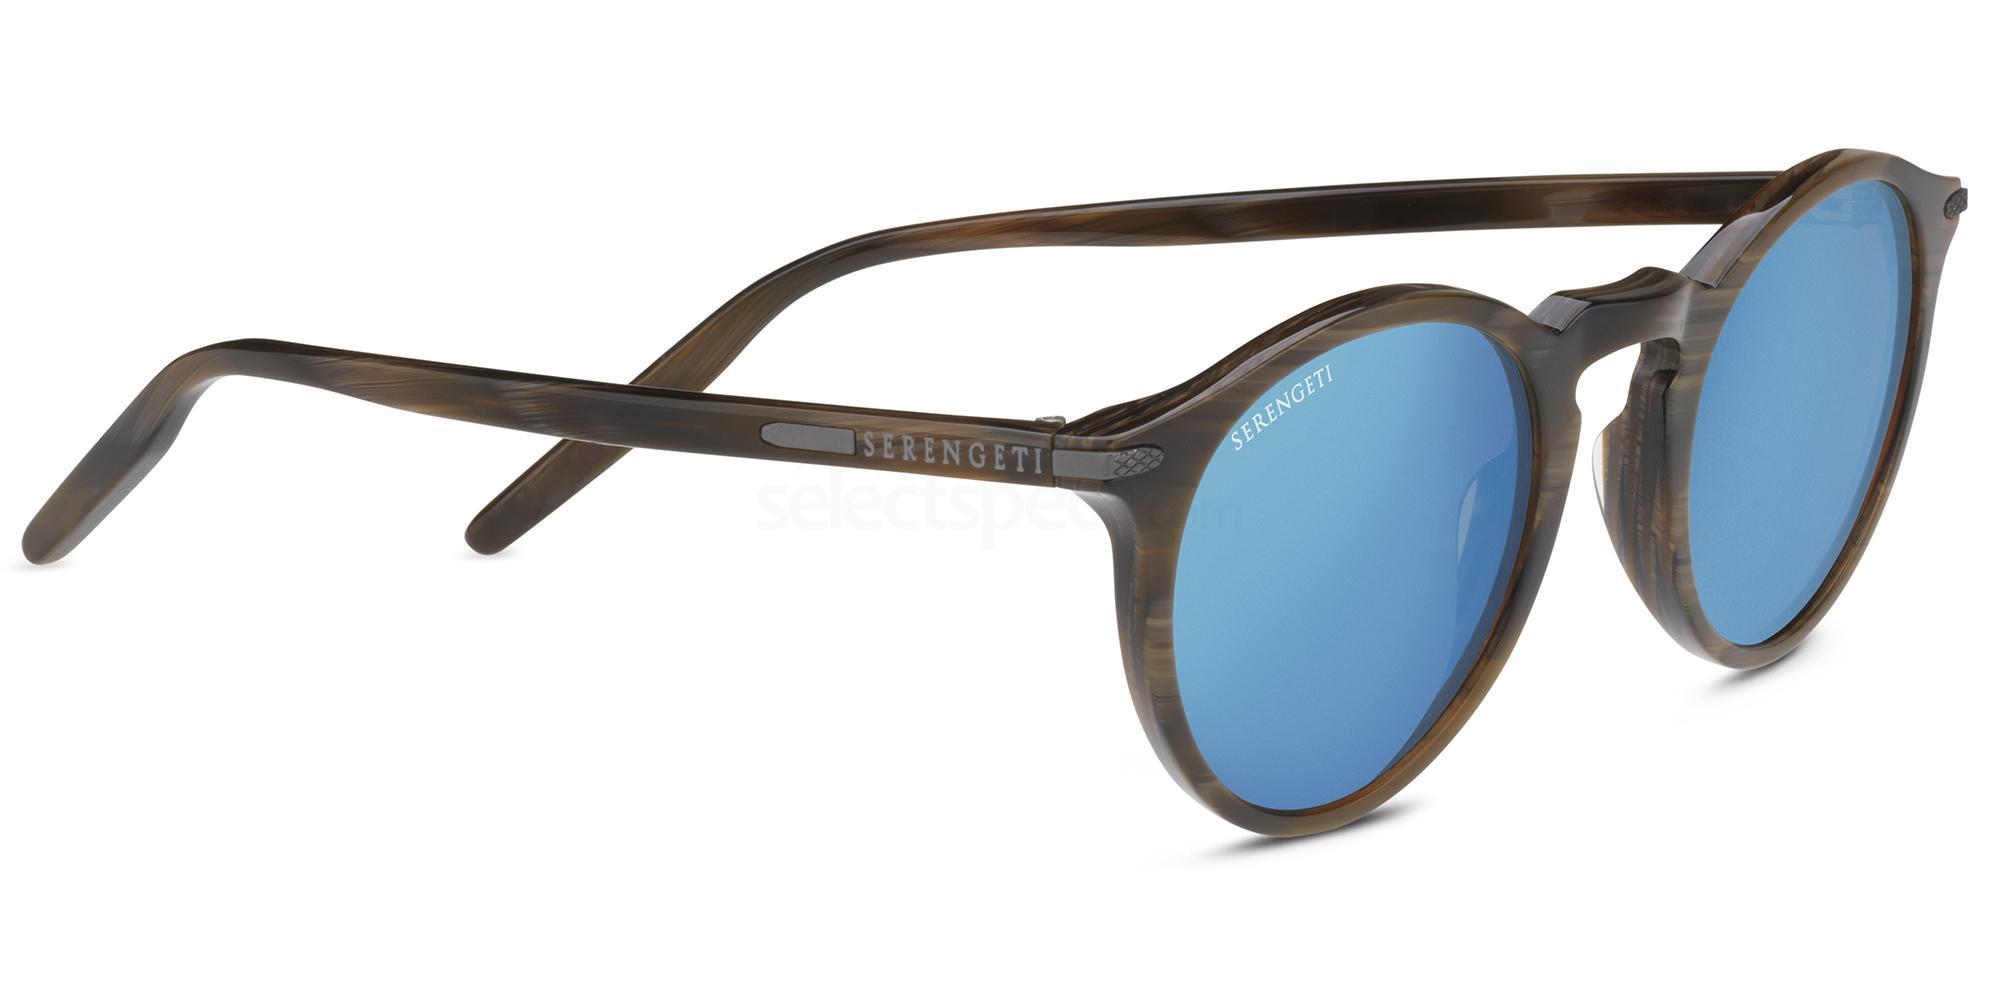 8835 RAFFAELE Sunglasses, Serengeti